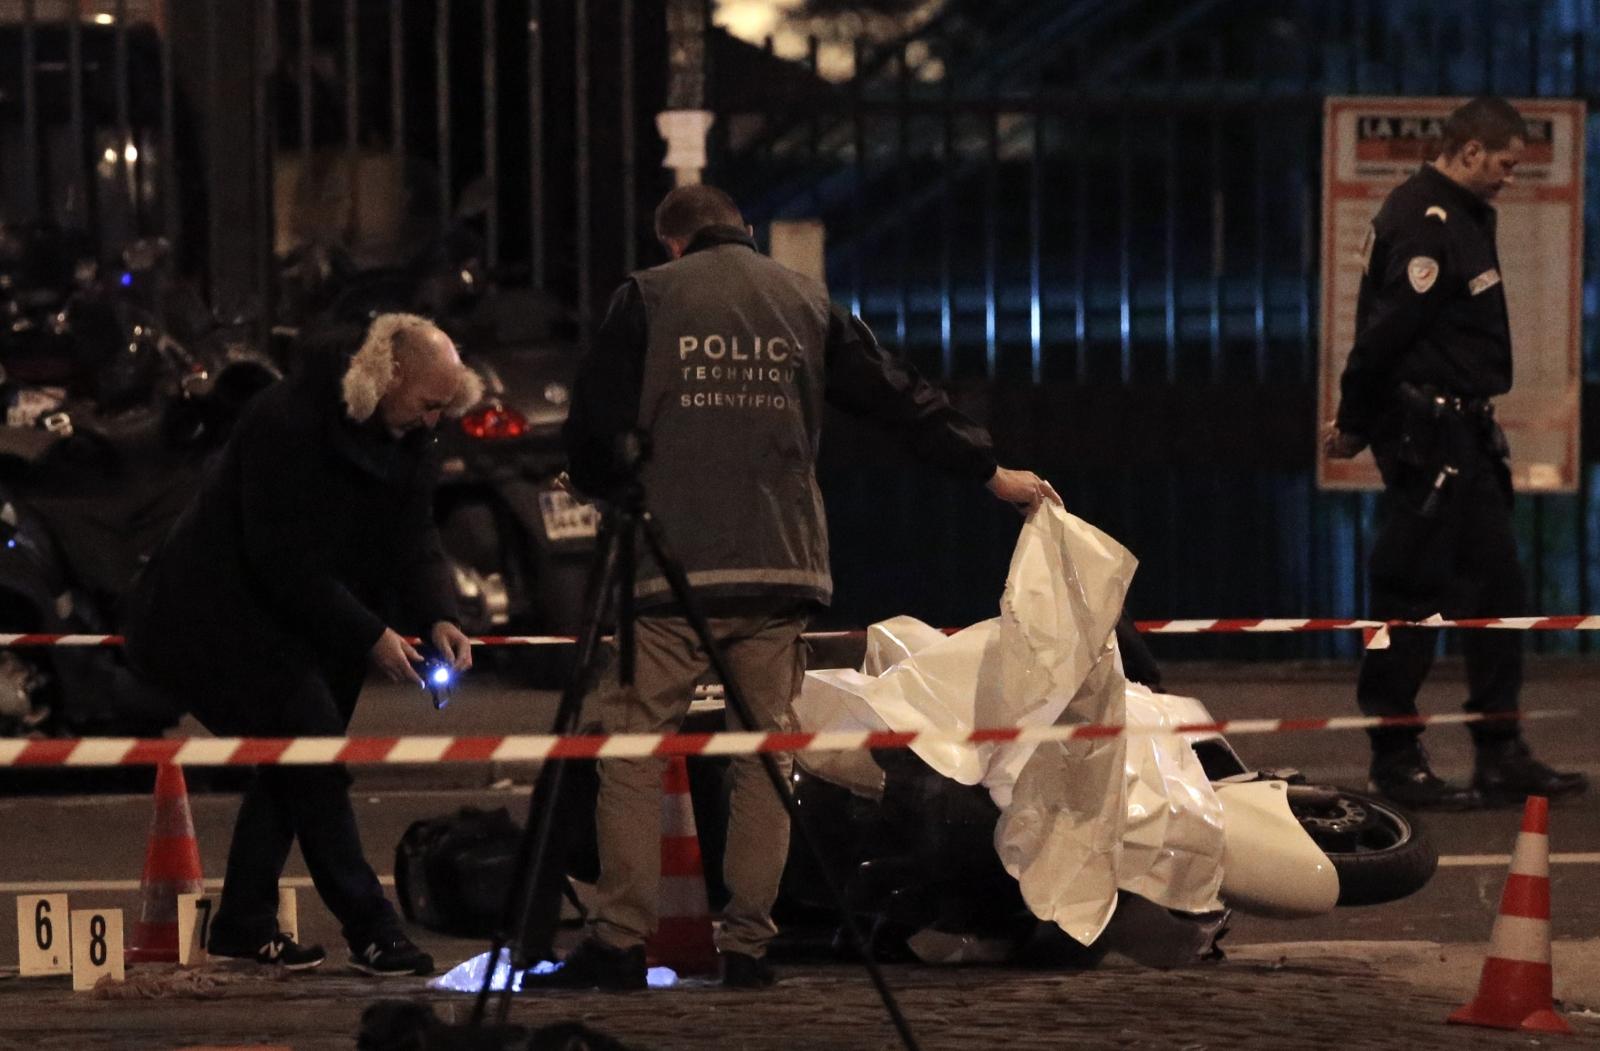 Paris Cartier Armed Robbery